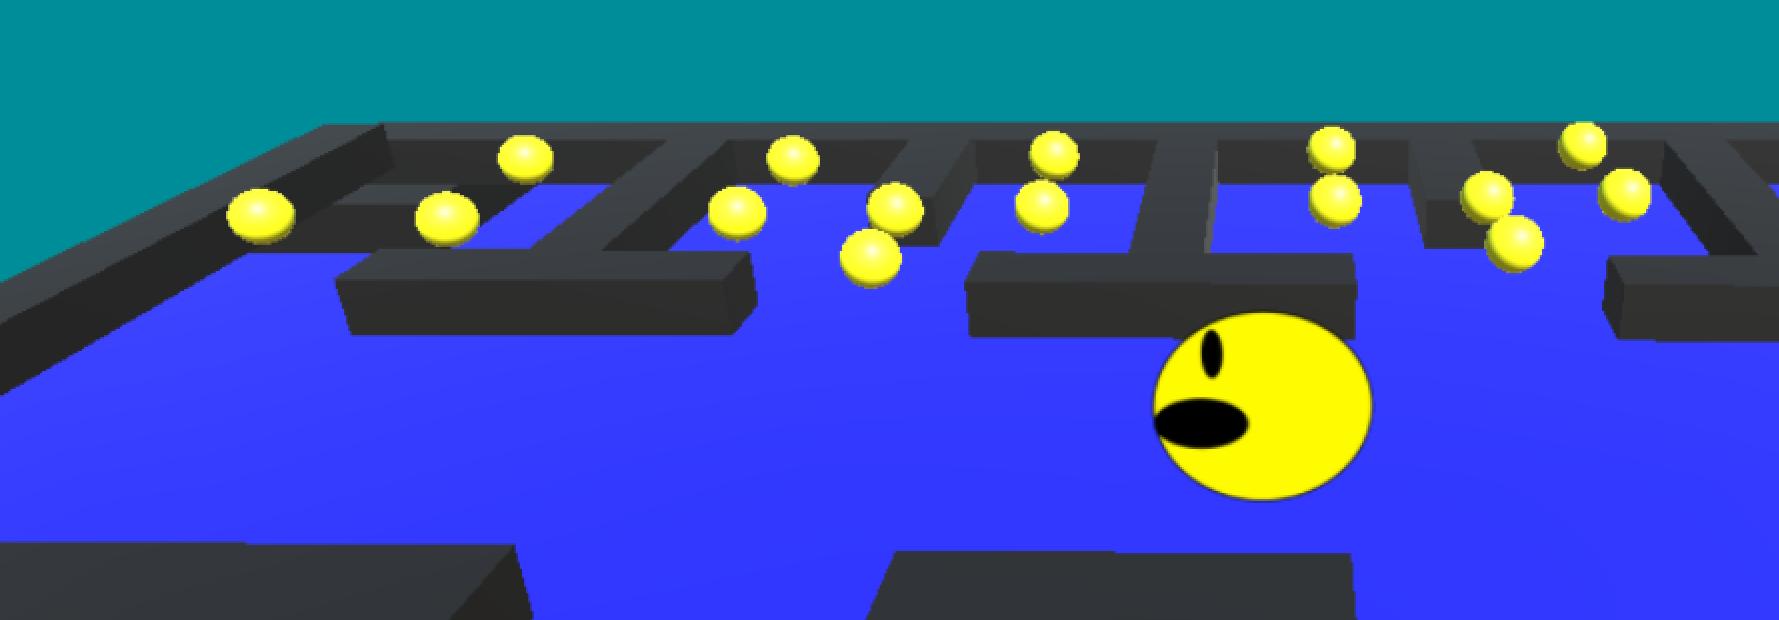 Maze Guy Gold